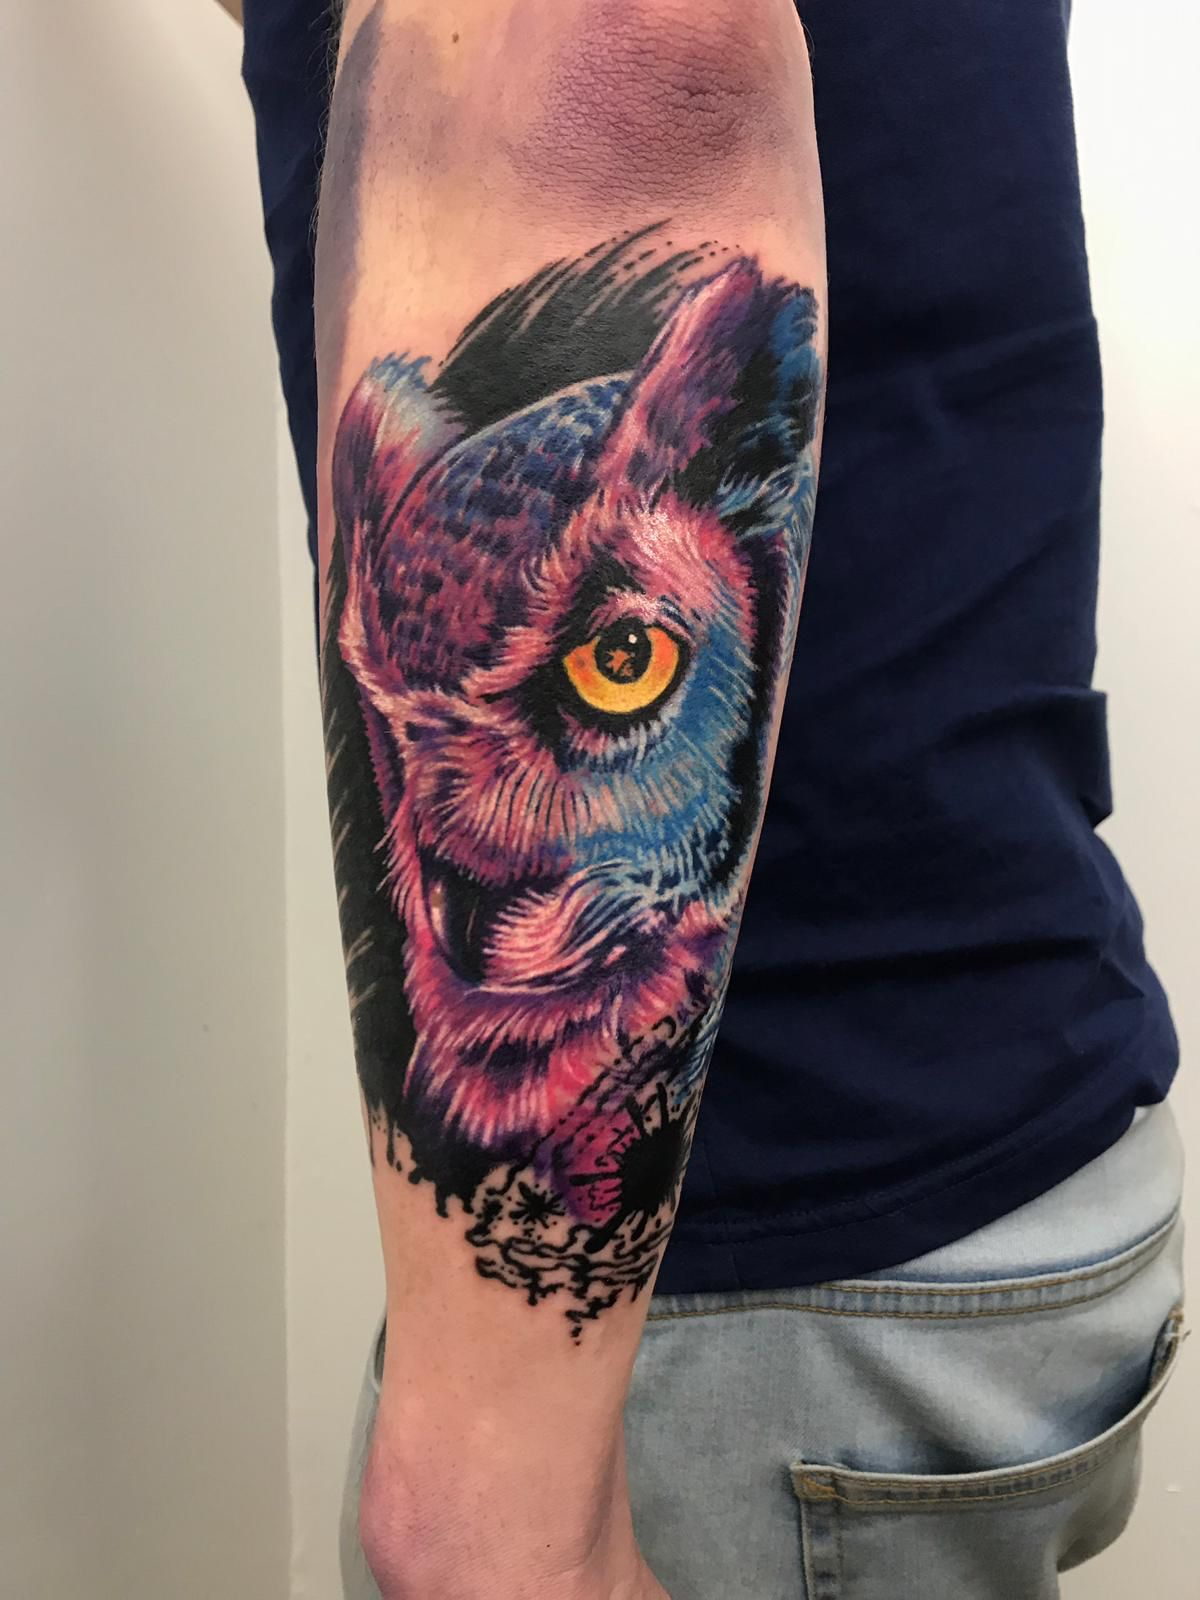 Artist Tibor Black Www Holytrinitytattoos Co Uk Holytrinitytattoos Gmail Com Send Us A Message Call Us On 0 Trinity Tattoo Tattoos Tattoo Studio